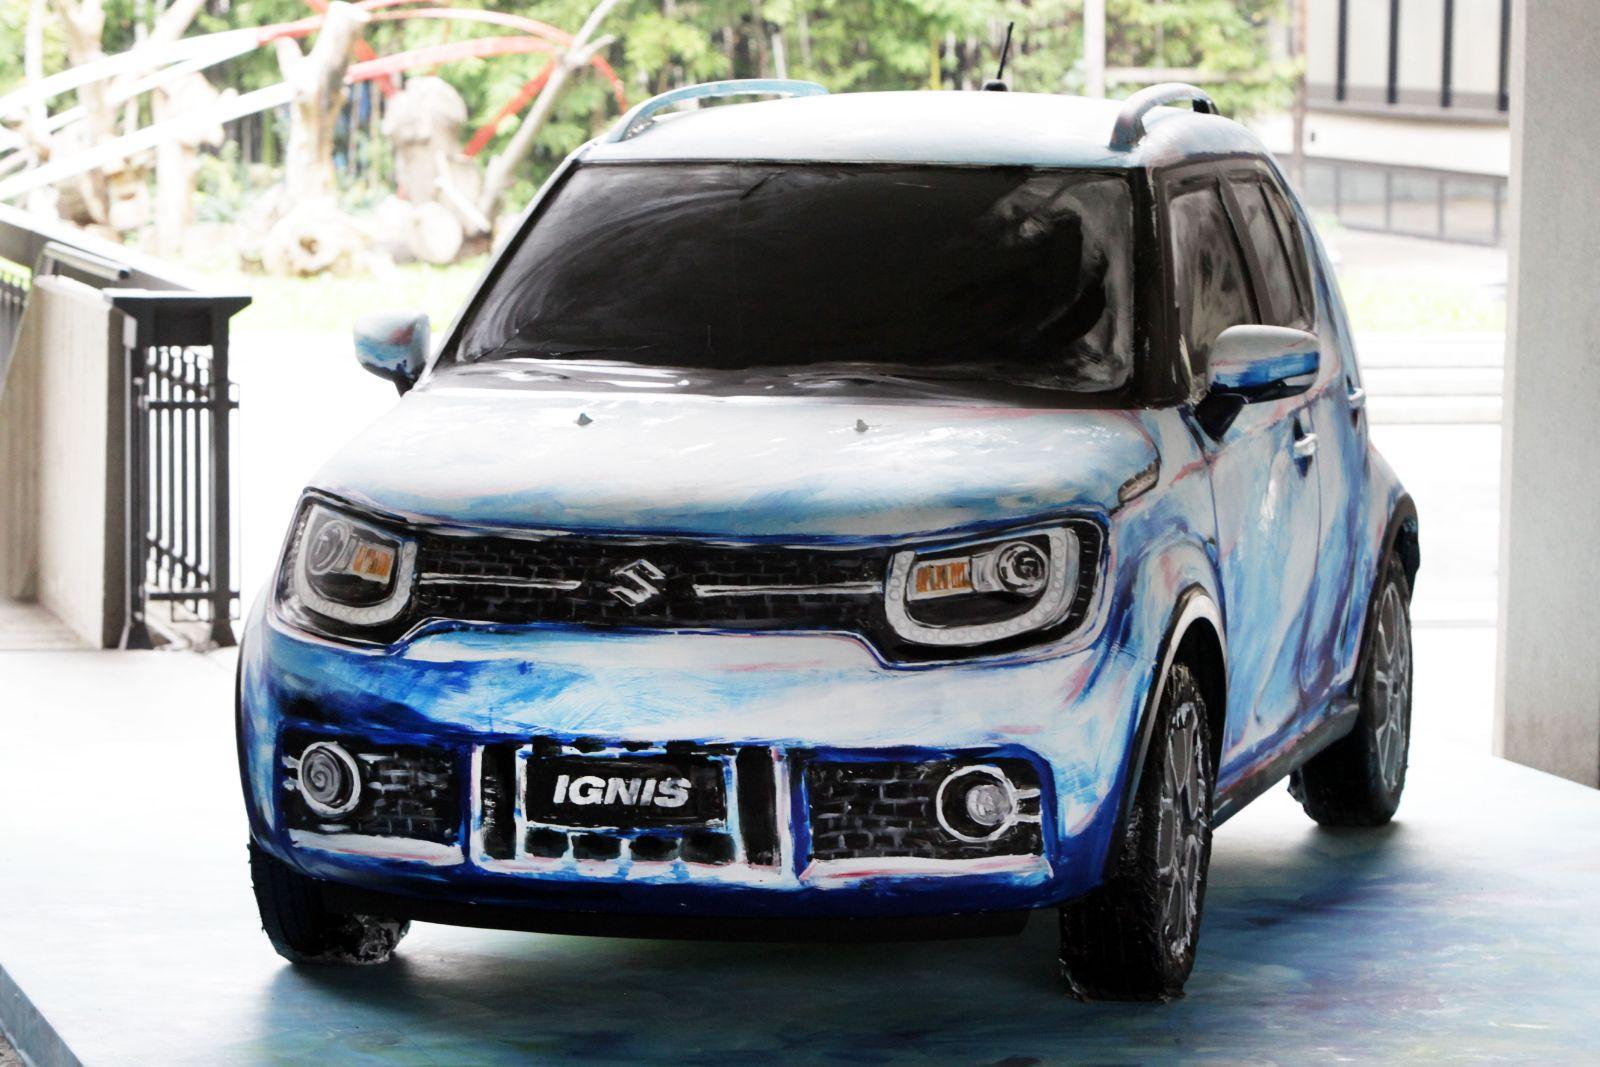 95-c-s-asta-ignis-hybrid-art-4